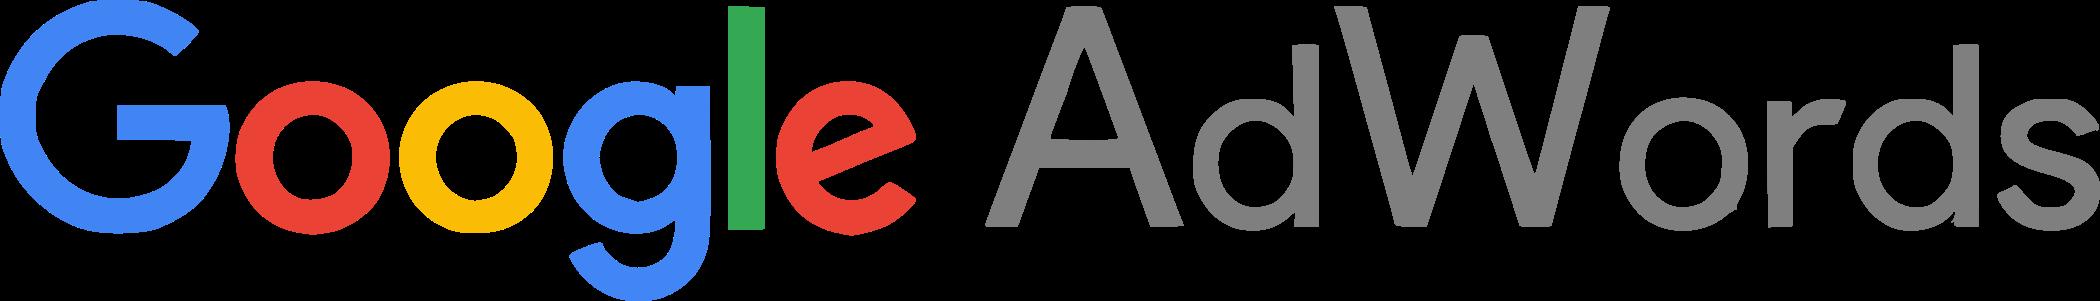 google adwords logo 2 - Google AdWords Logo